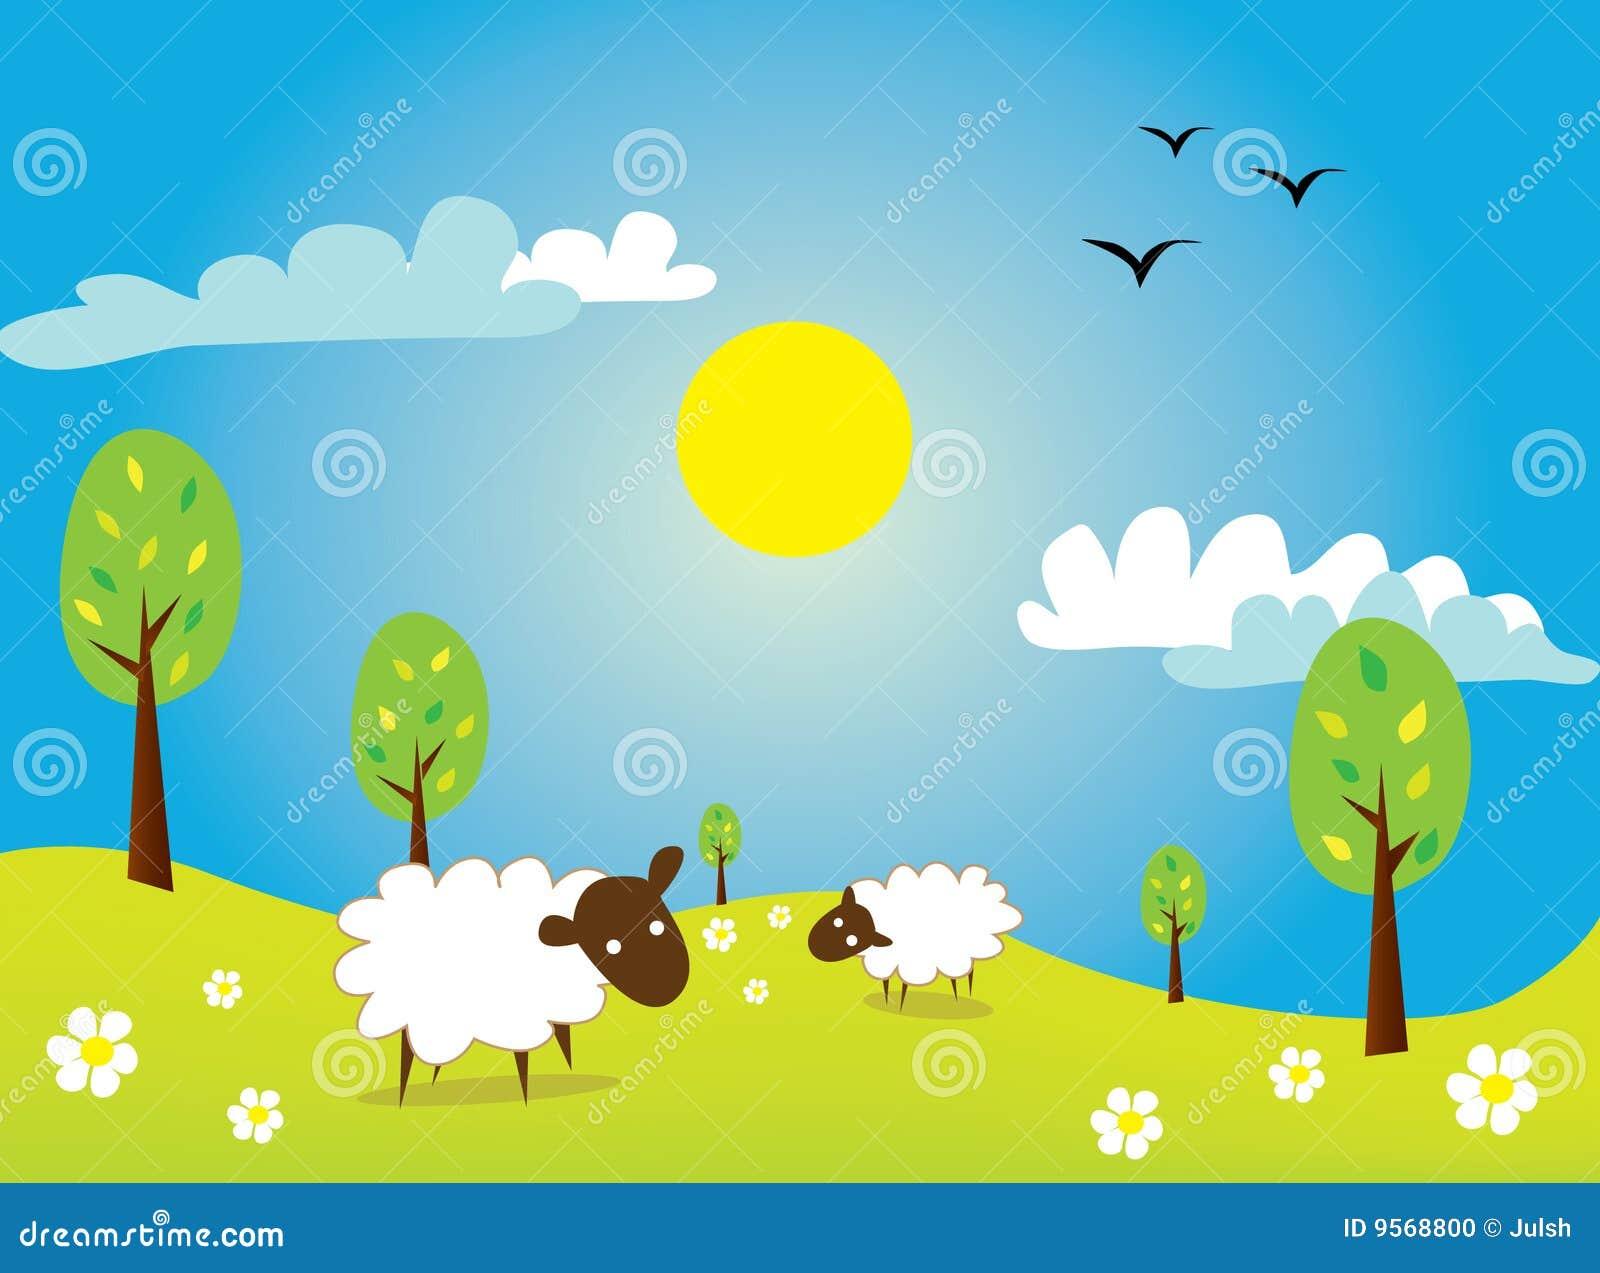 sheep stock illustration illustration of happiness trees